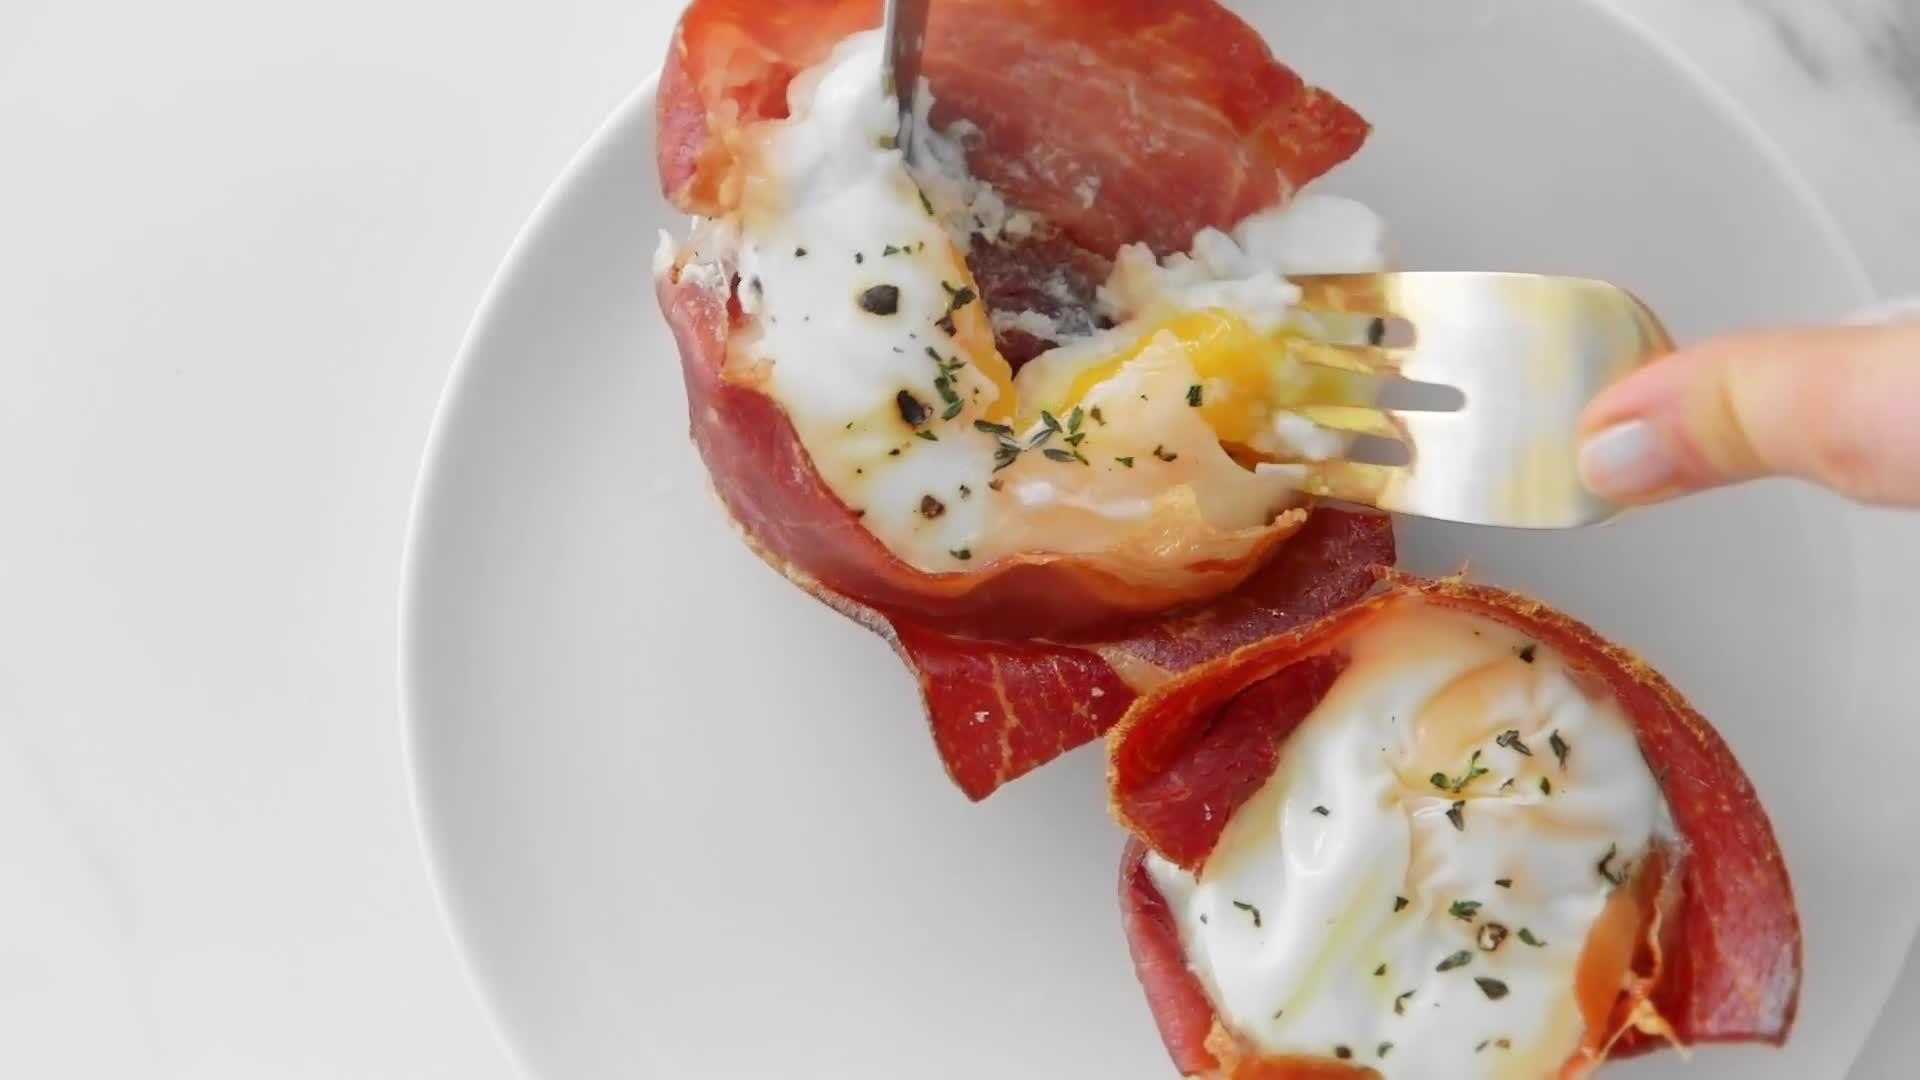 How to Make Prosciutto Egg Baskets